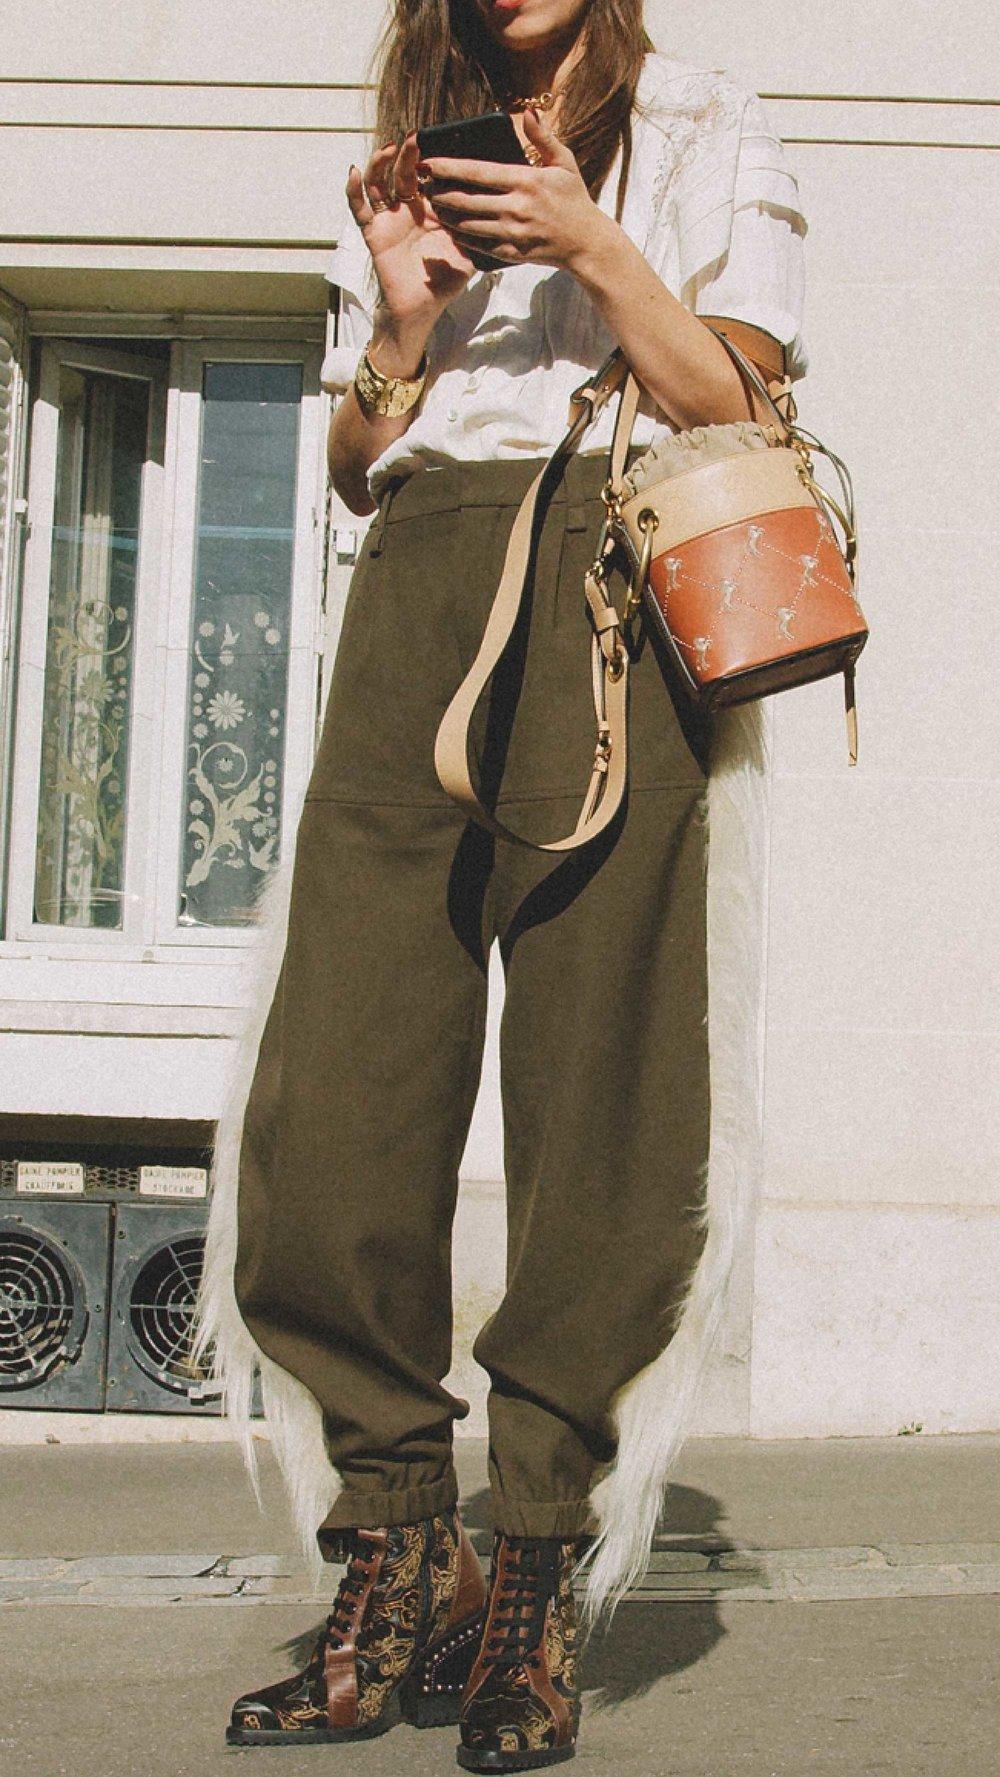 12 Best Chloe bags of Fashion Week -  CHLOe Roy mini leather bucket bag and Chloe Small Tess Leather Shoulder Bag15.jpg